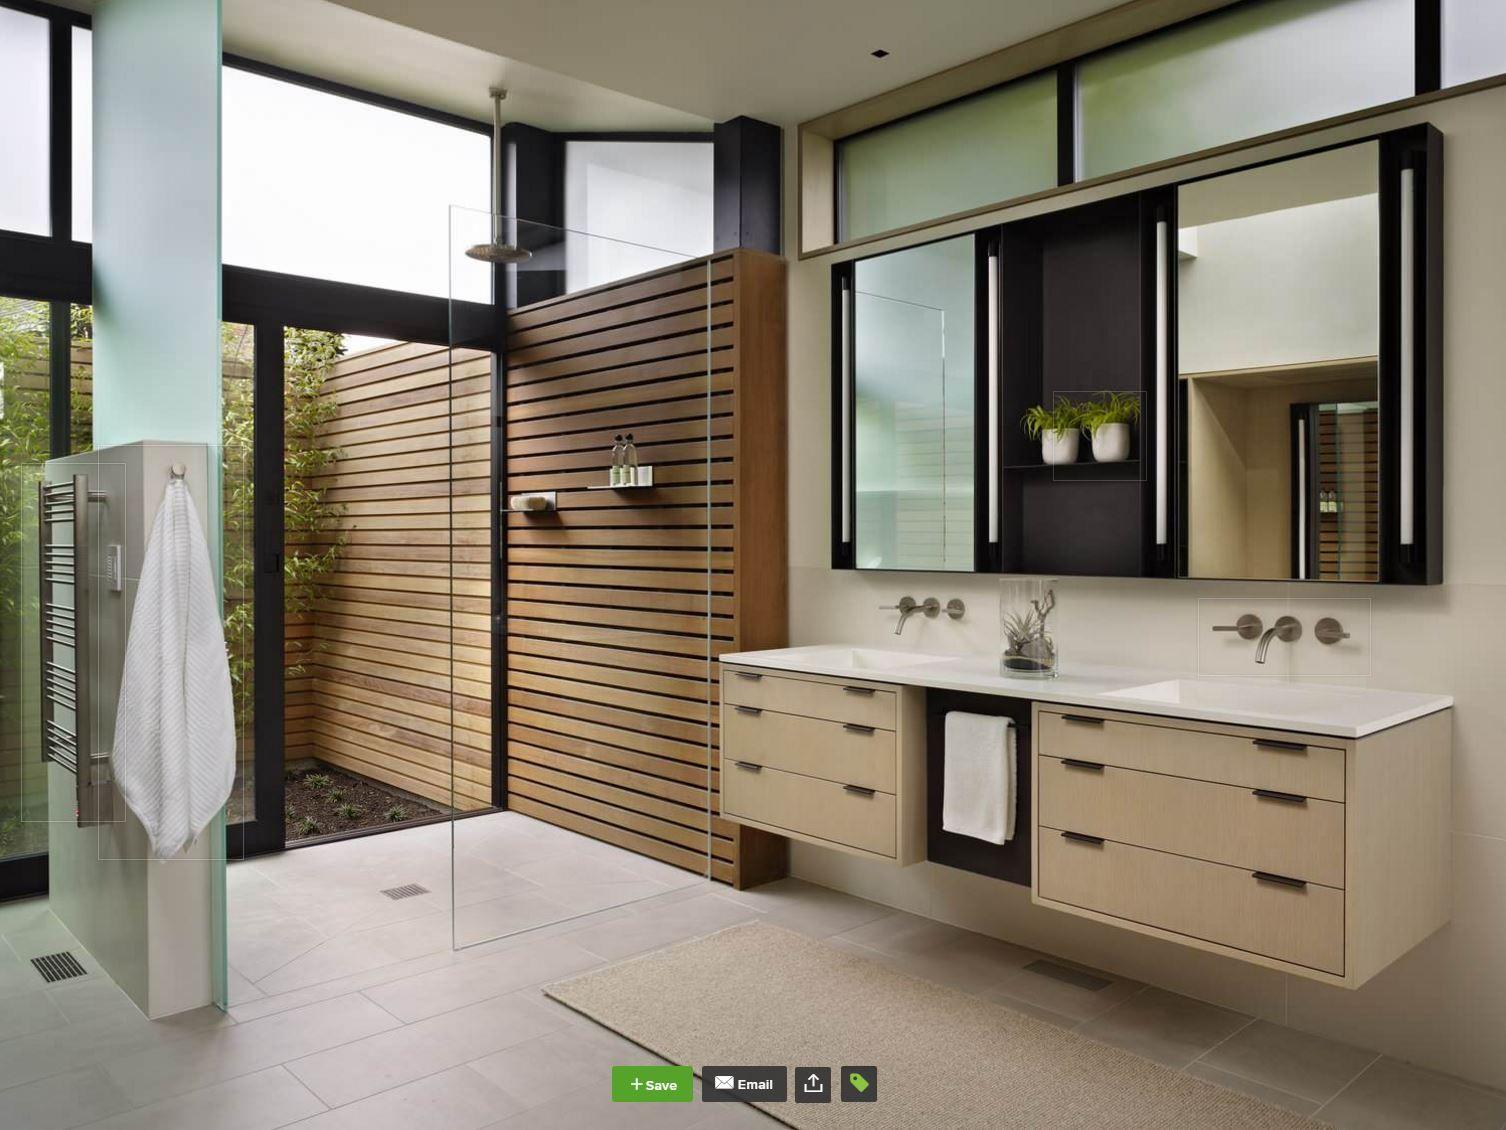 Glass Partition Home Pinterest Glass Partition - Glass partition for bathroom for bathroom decor ideas